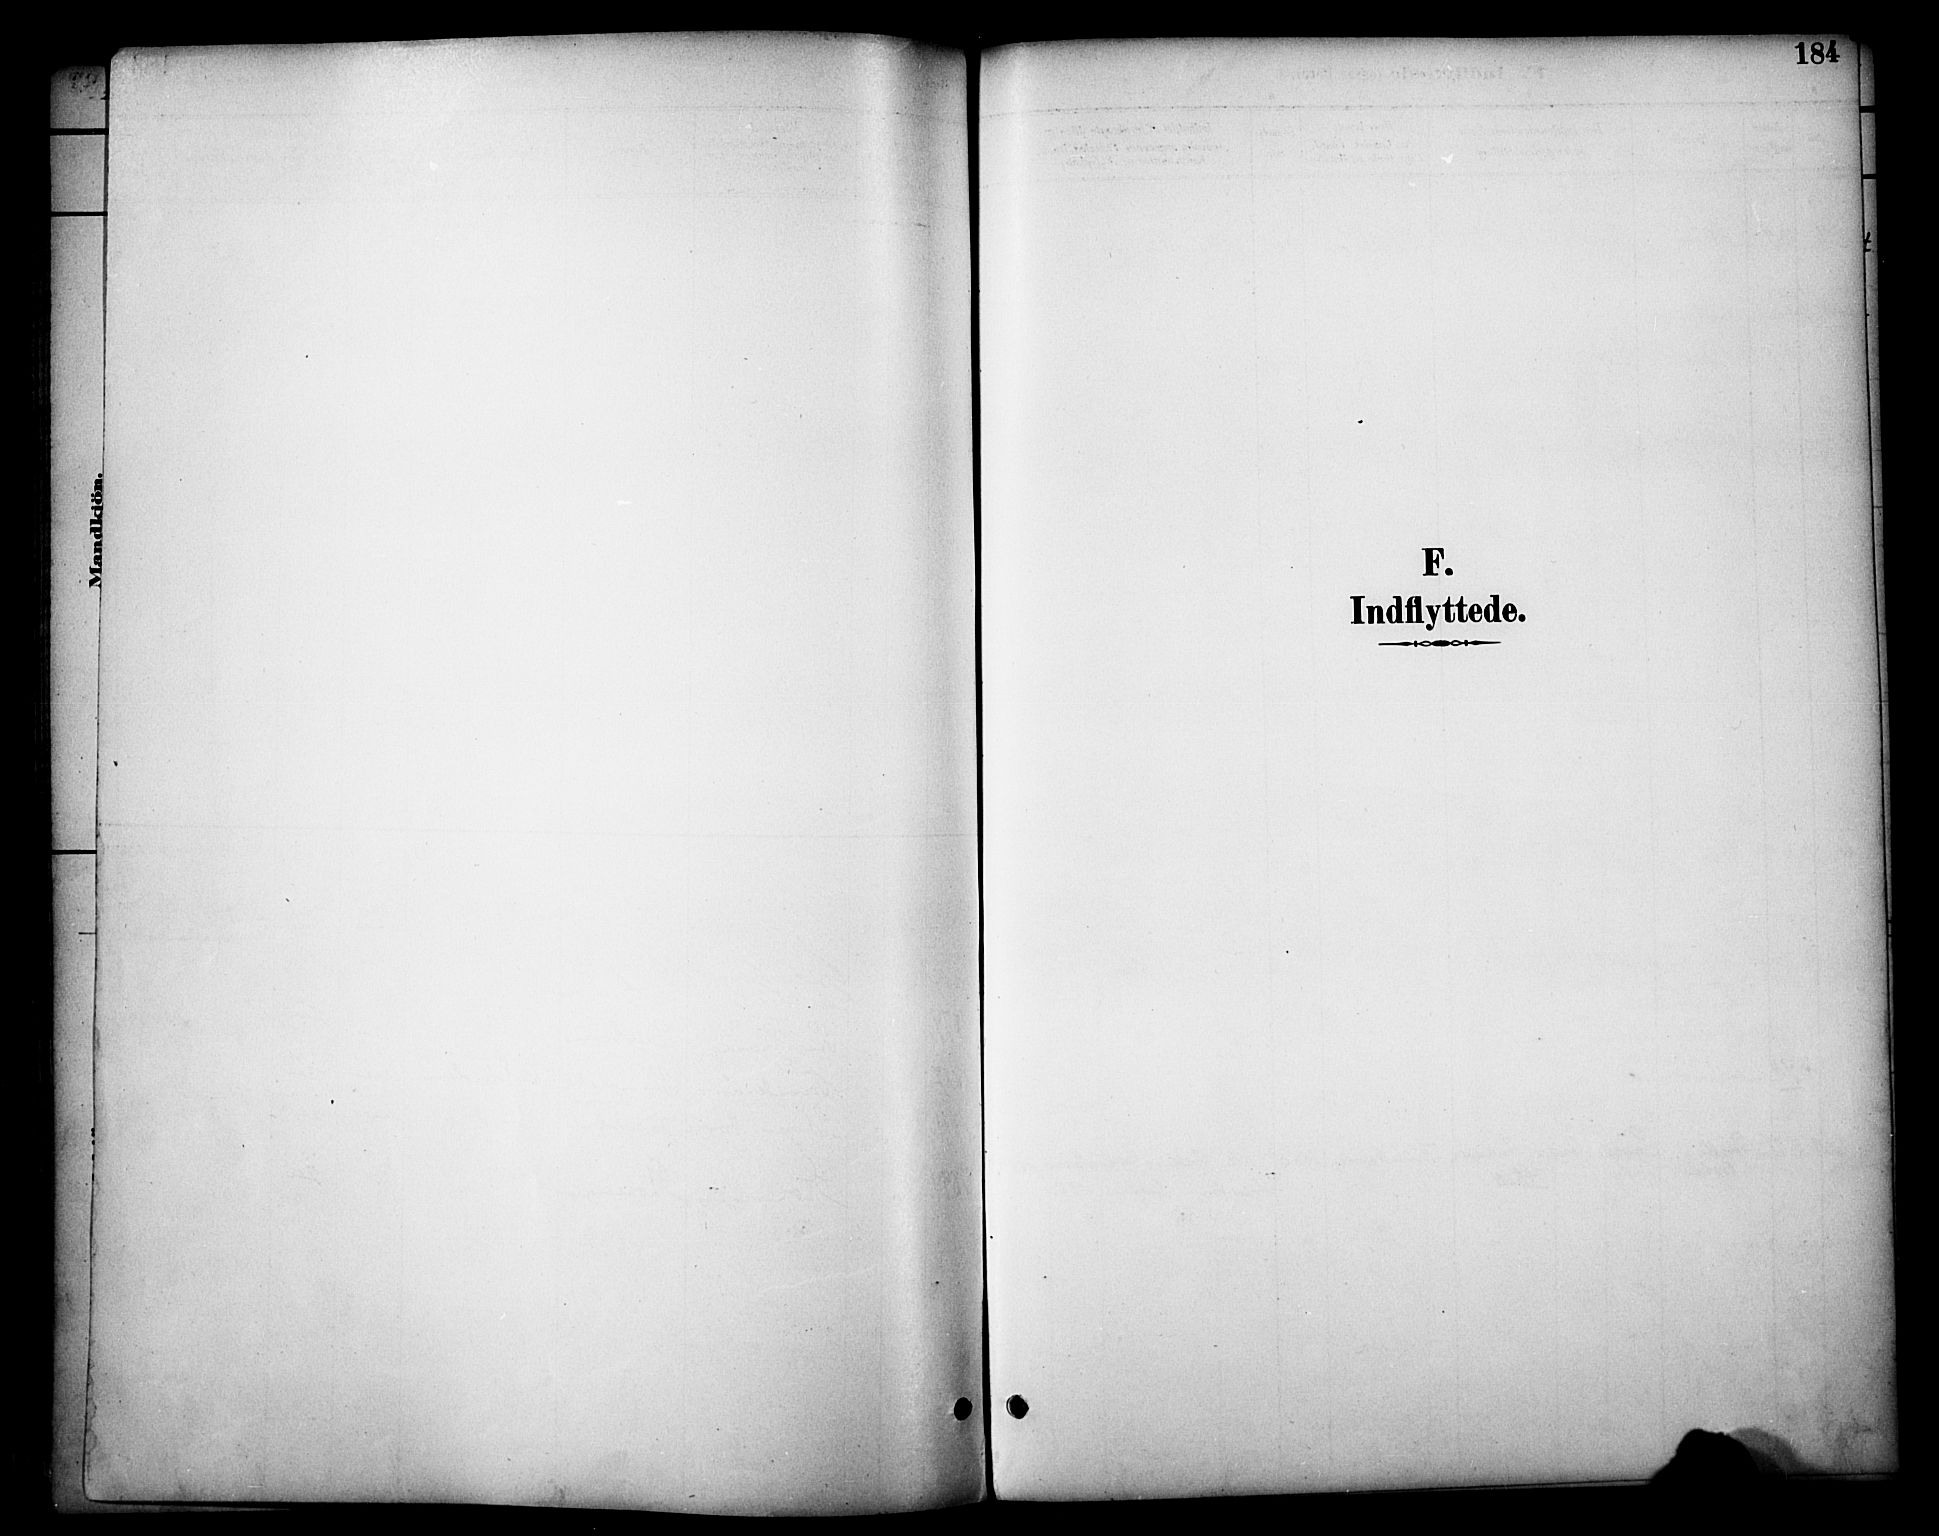 SAH, Dovre prestekontor, Ministerialbok nr. 3, 1891-1901, s. 184